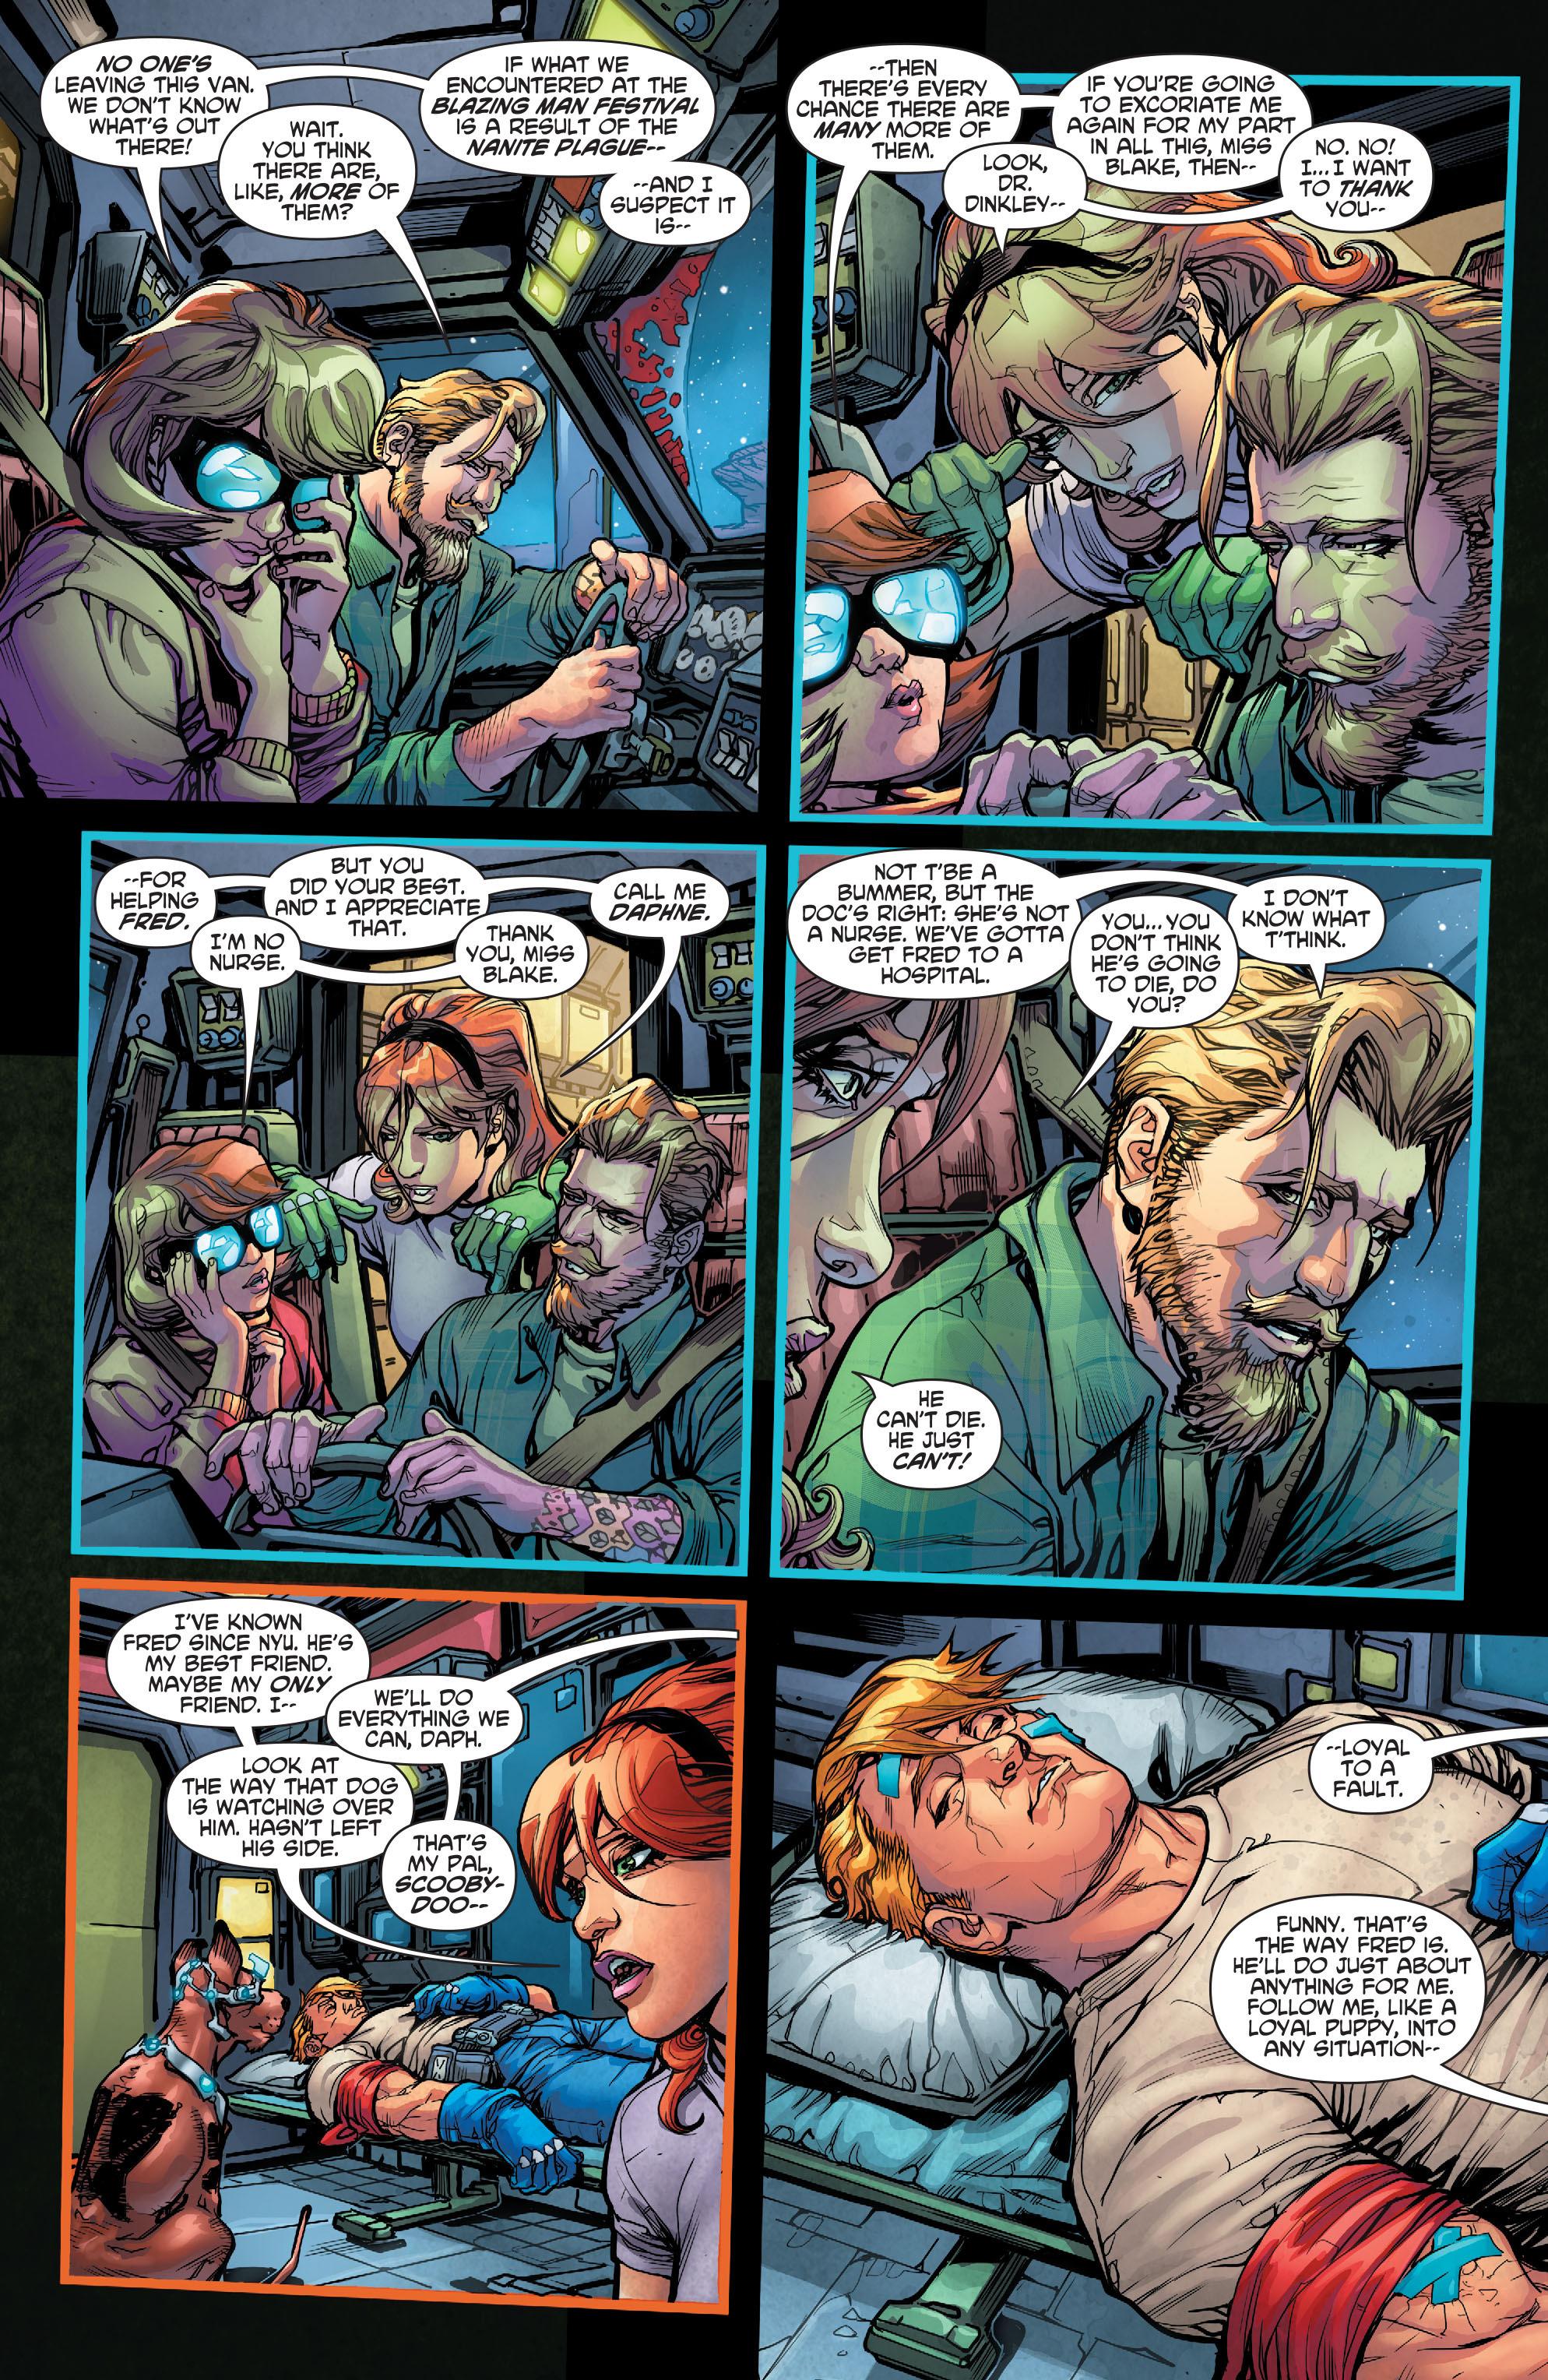 Read online Scooby Apocalypse comic -  Issue #3 - 5